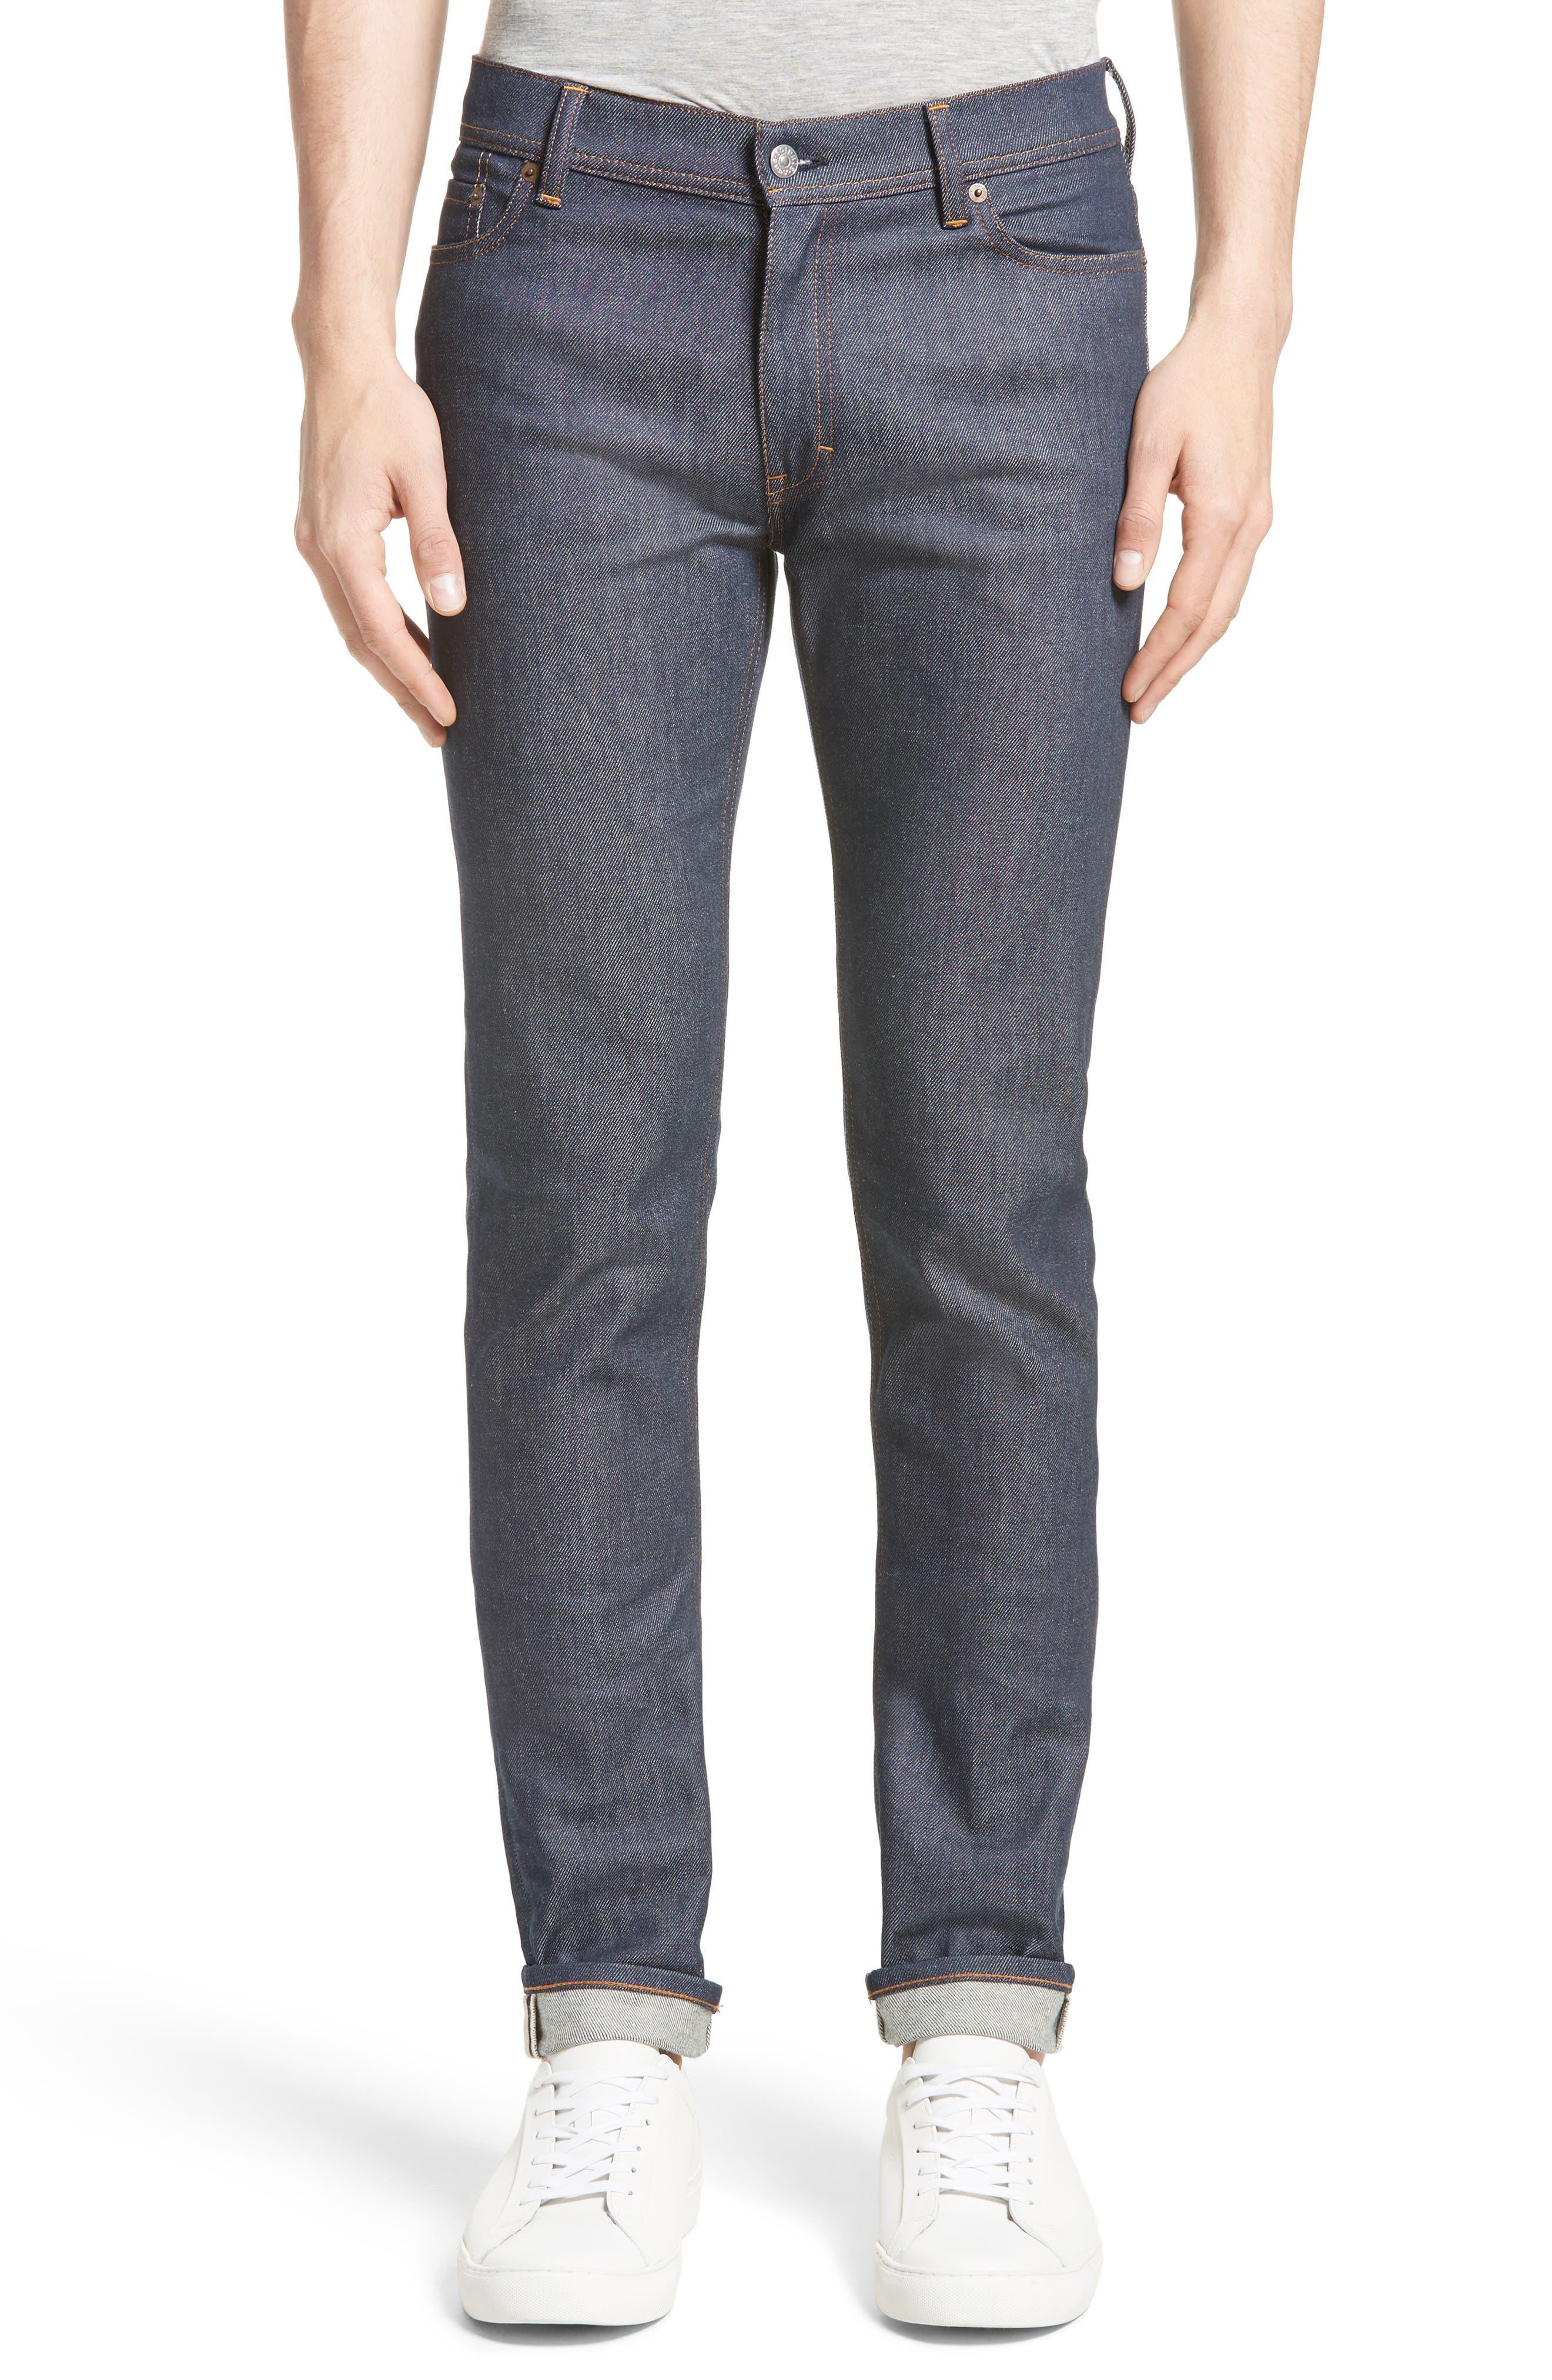 North Skinny Jeans,                         Main,                         color, INDIGO